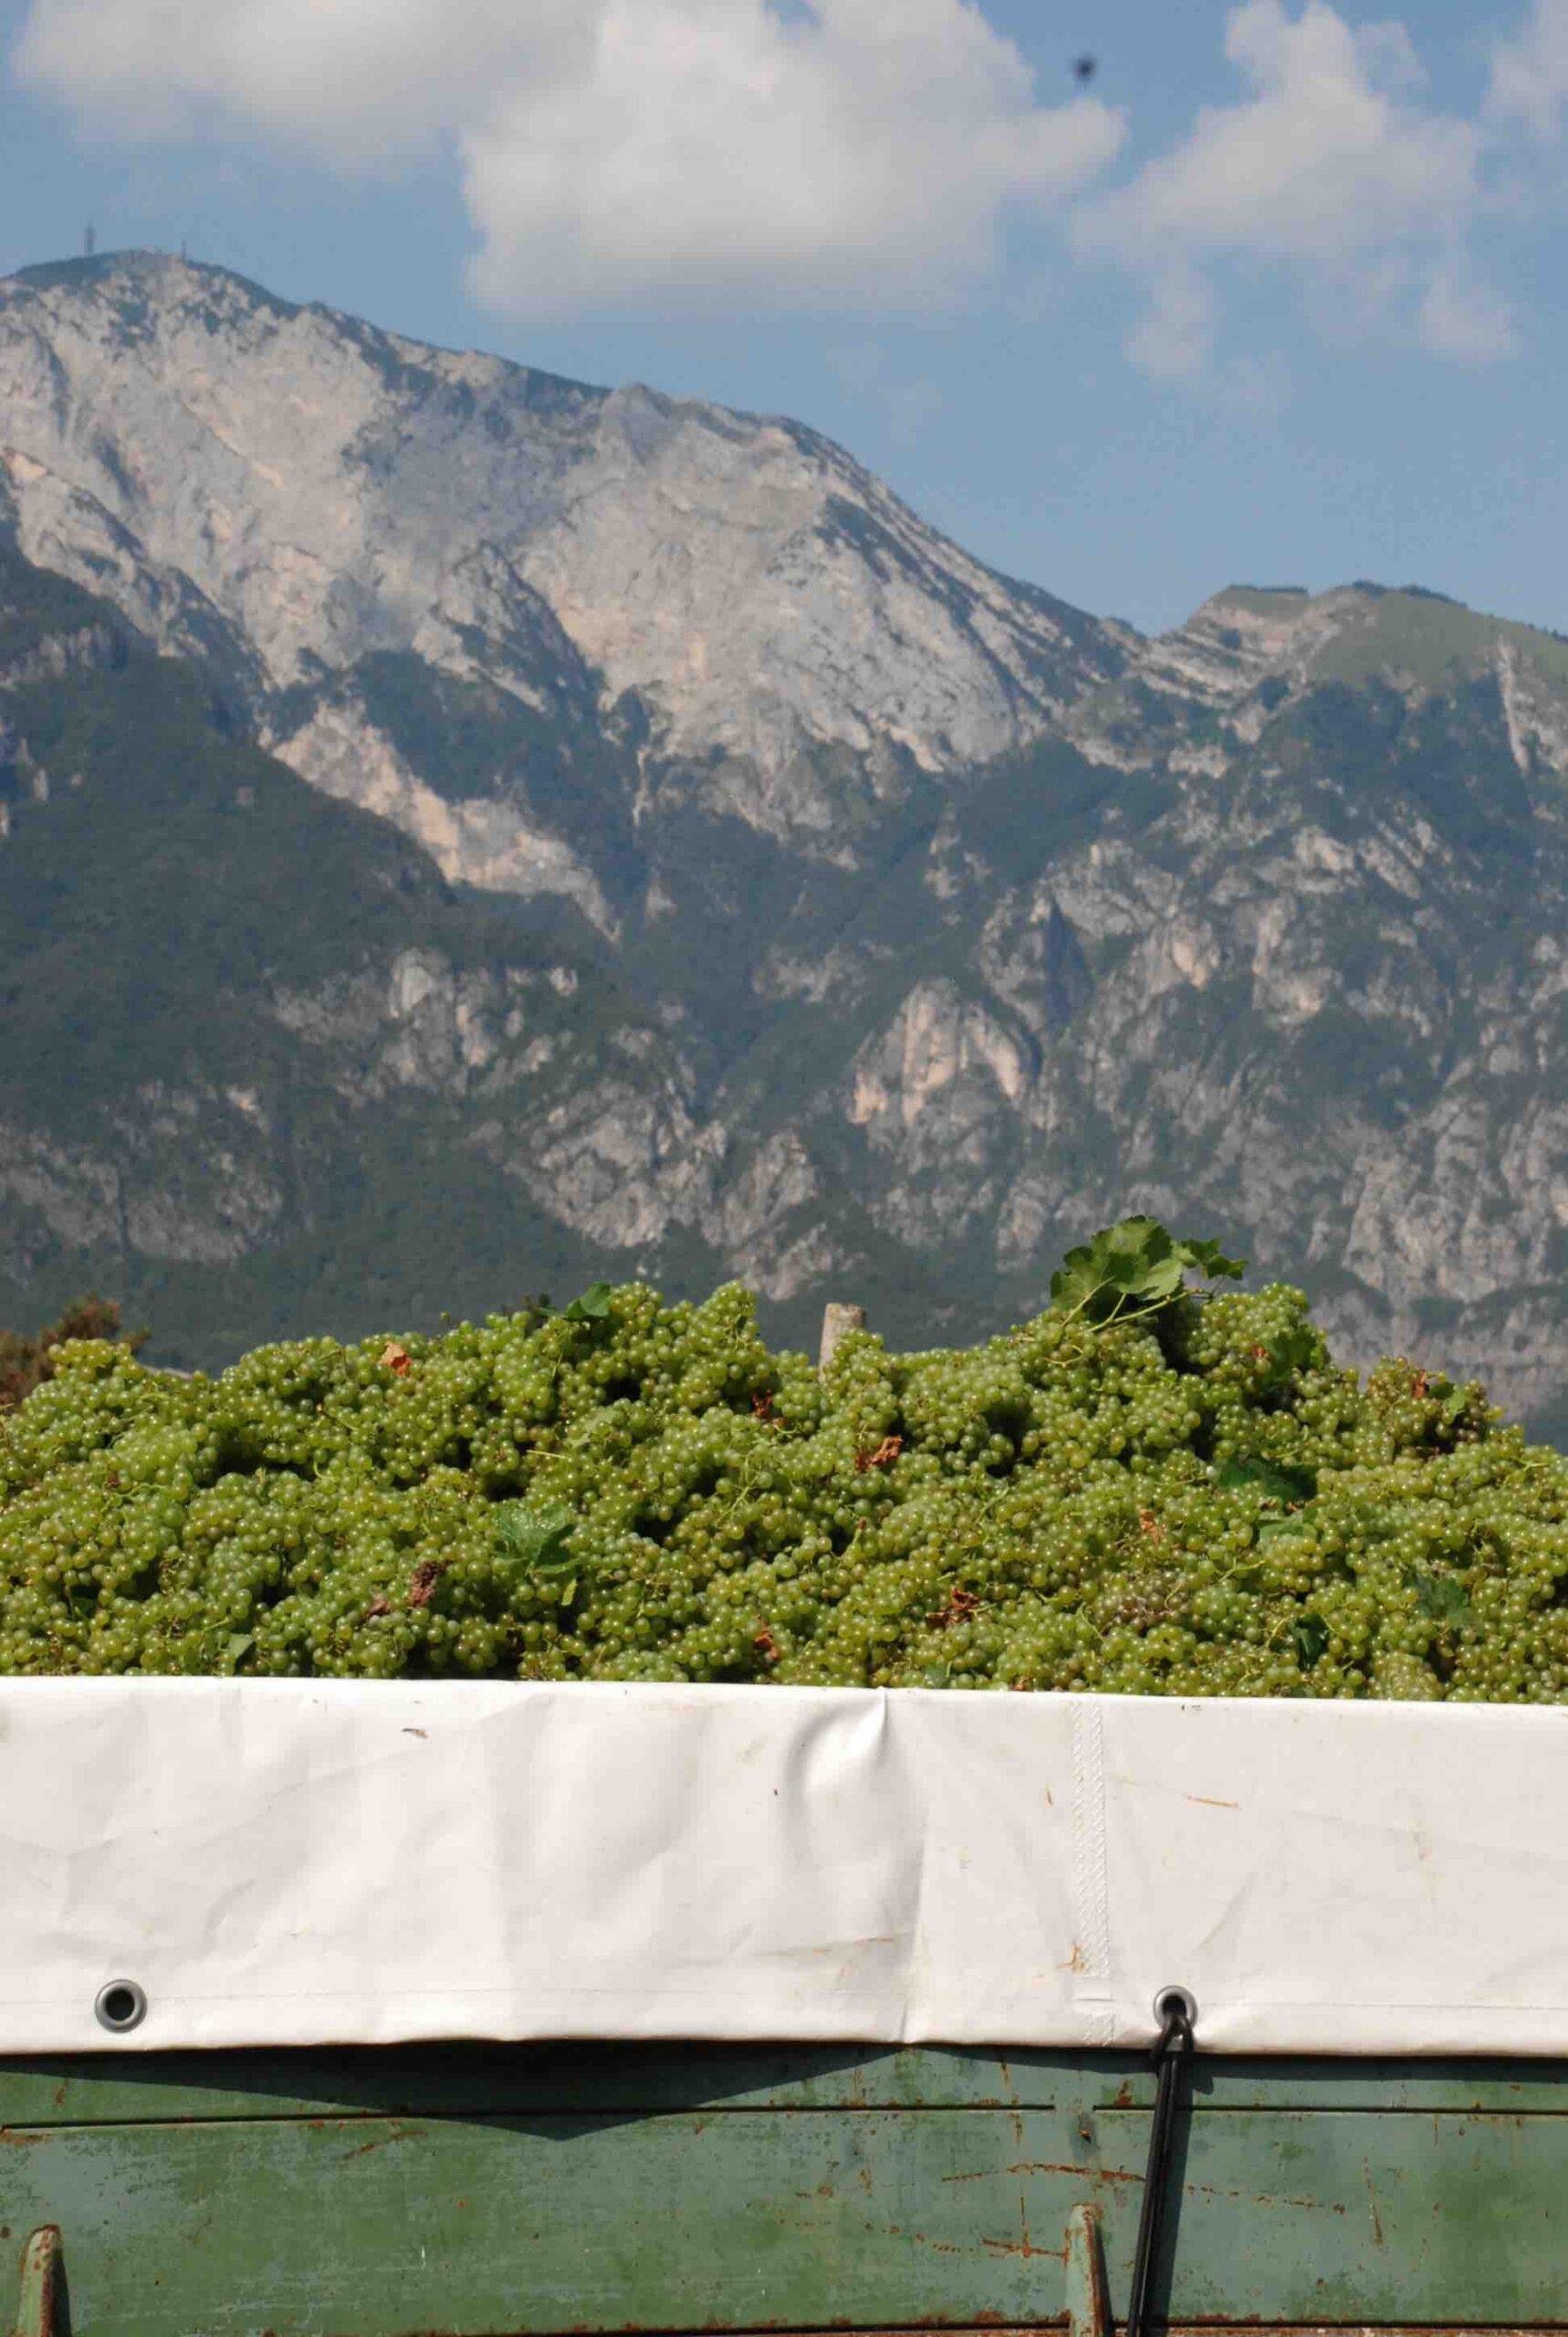 uva e montagna LeVIDE TRENTINO